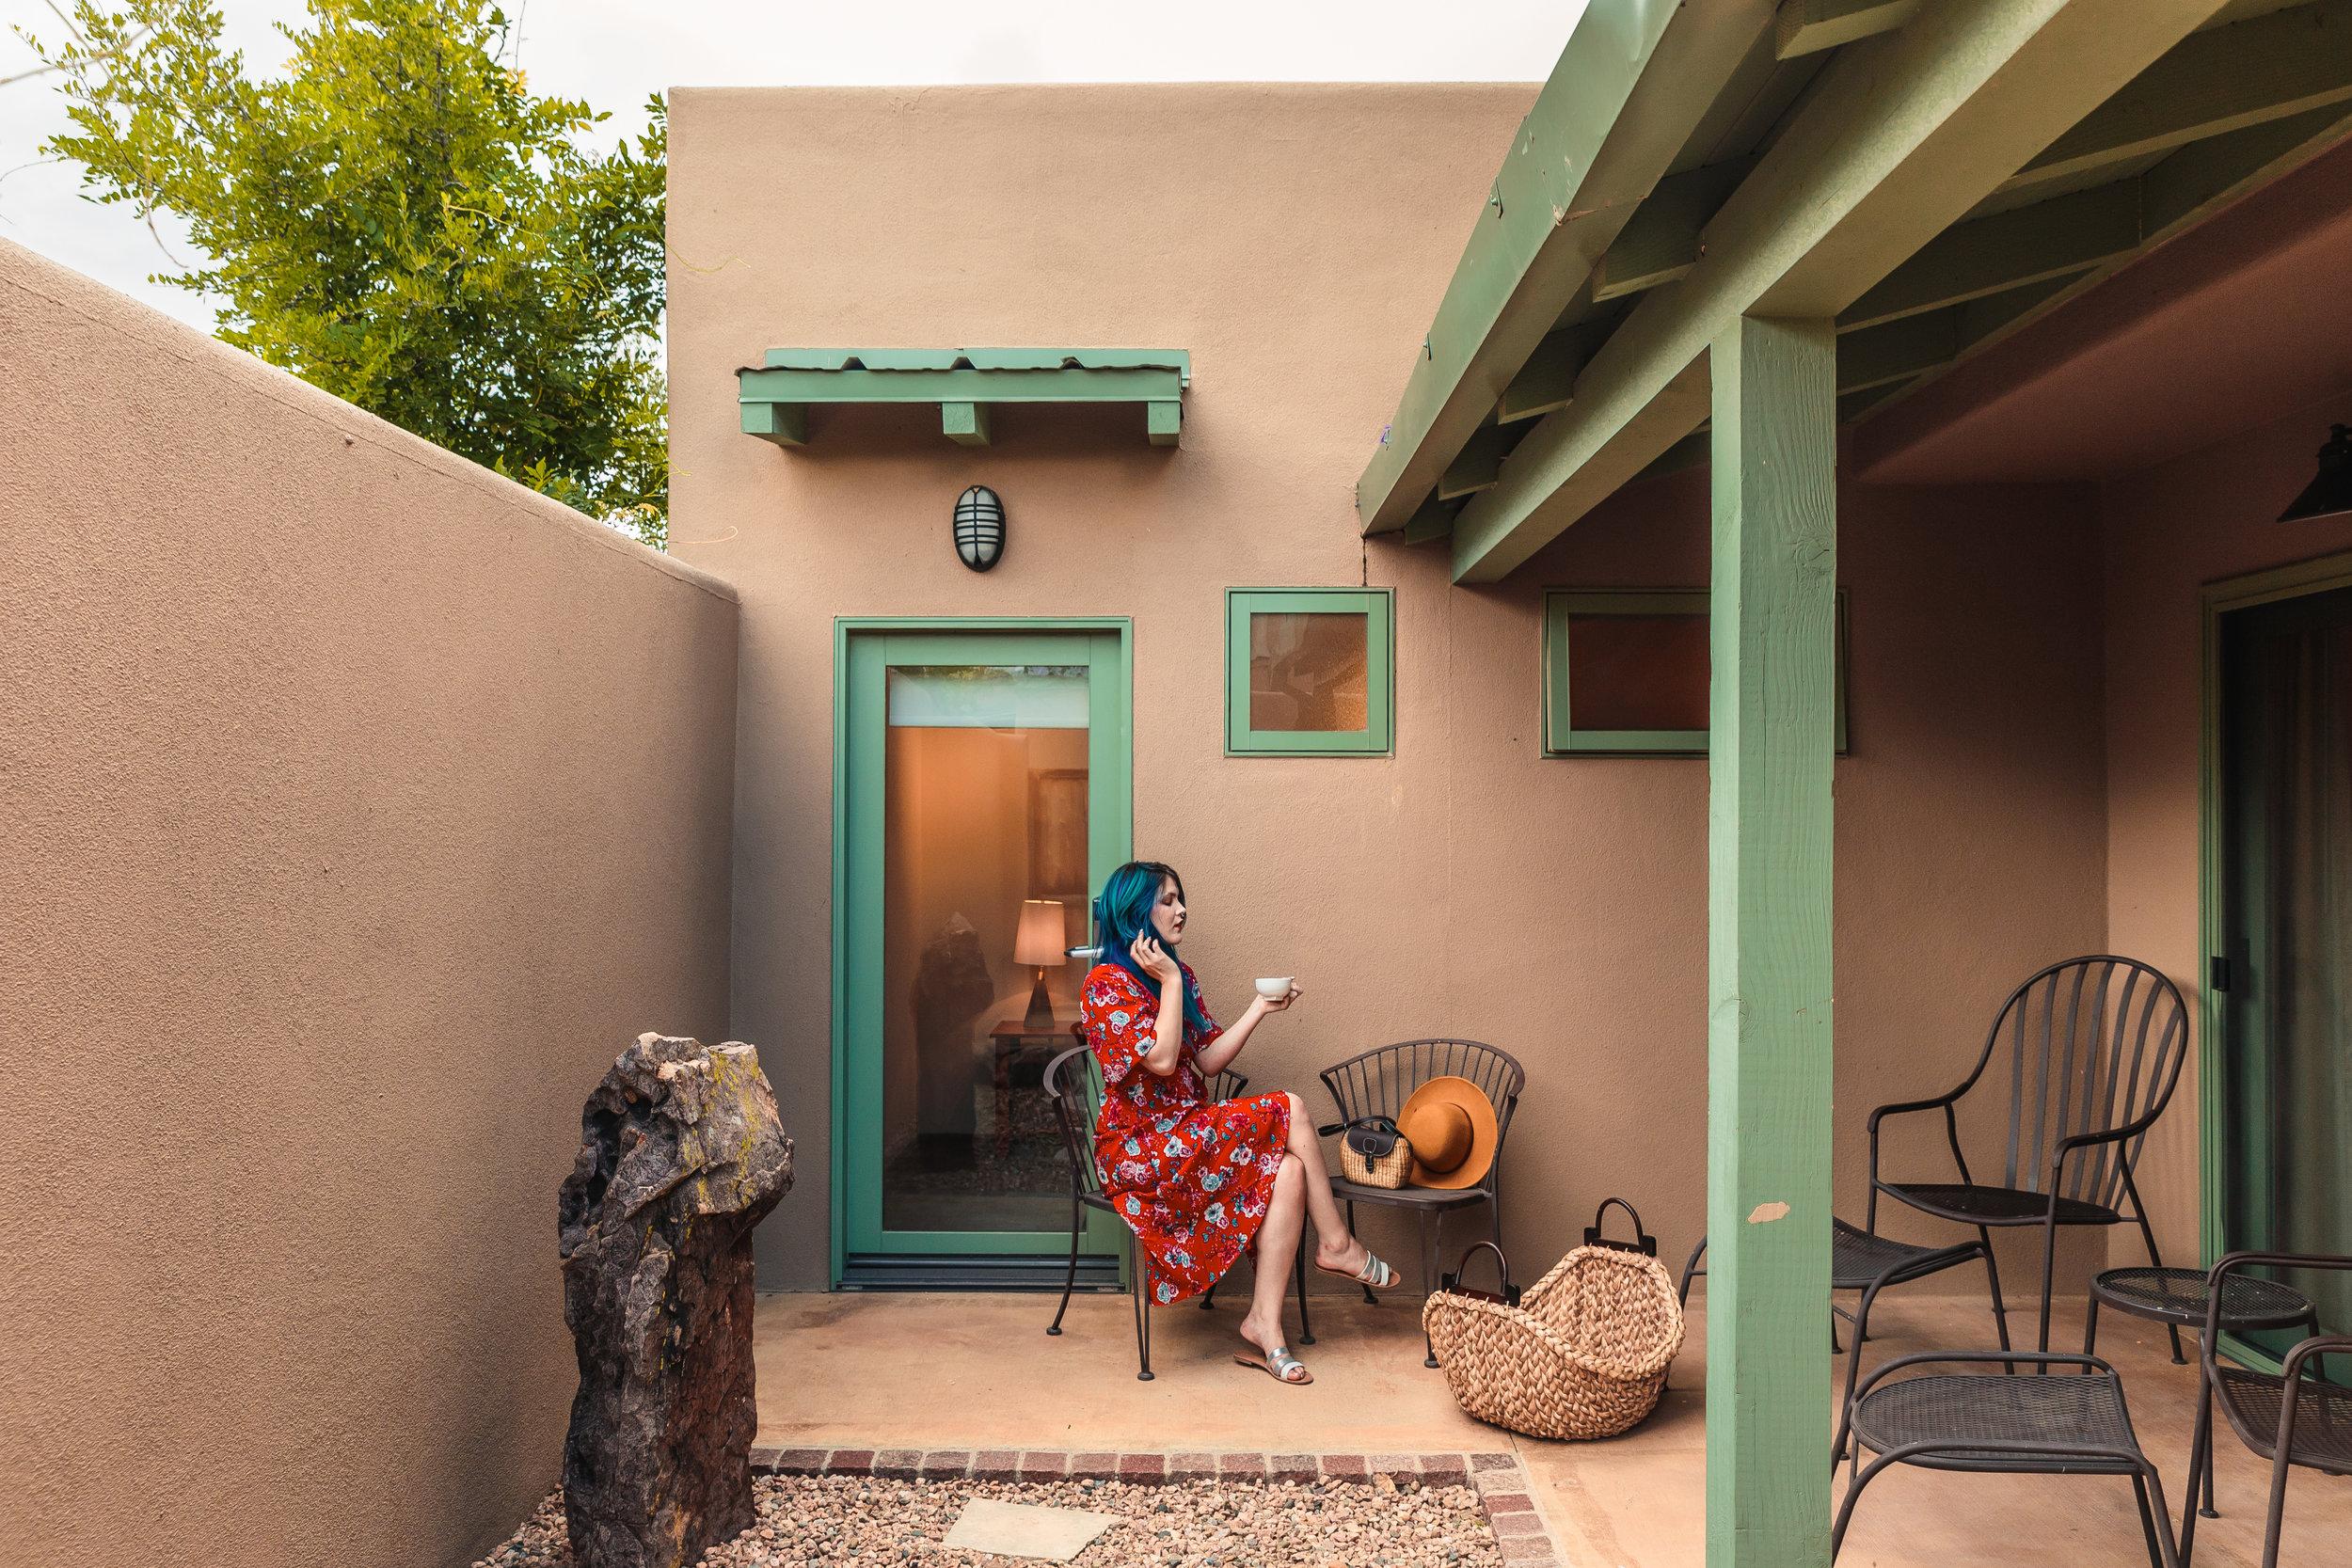 Your Weekend Getaway Guide to Santa Fe // #readysetjetset #santafe #newmexico #travel www.readysetjetset.net